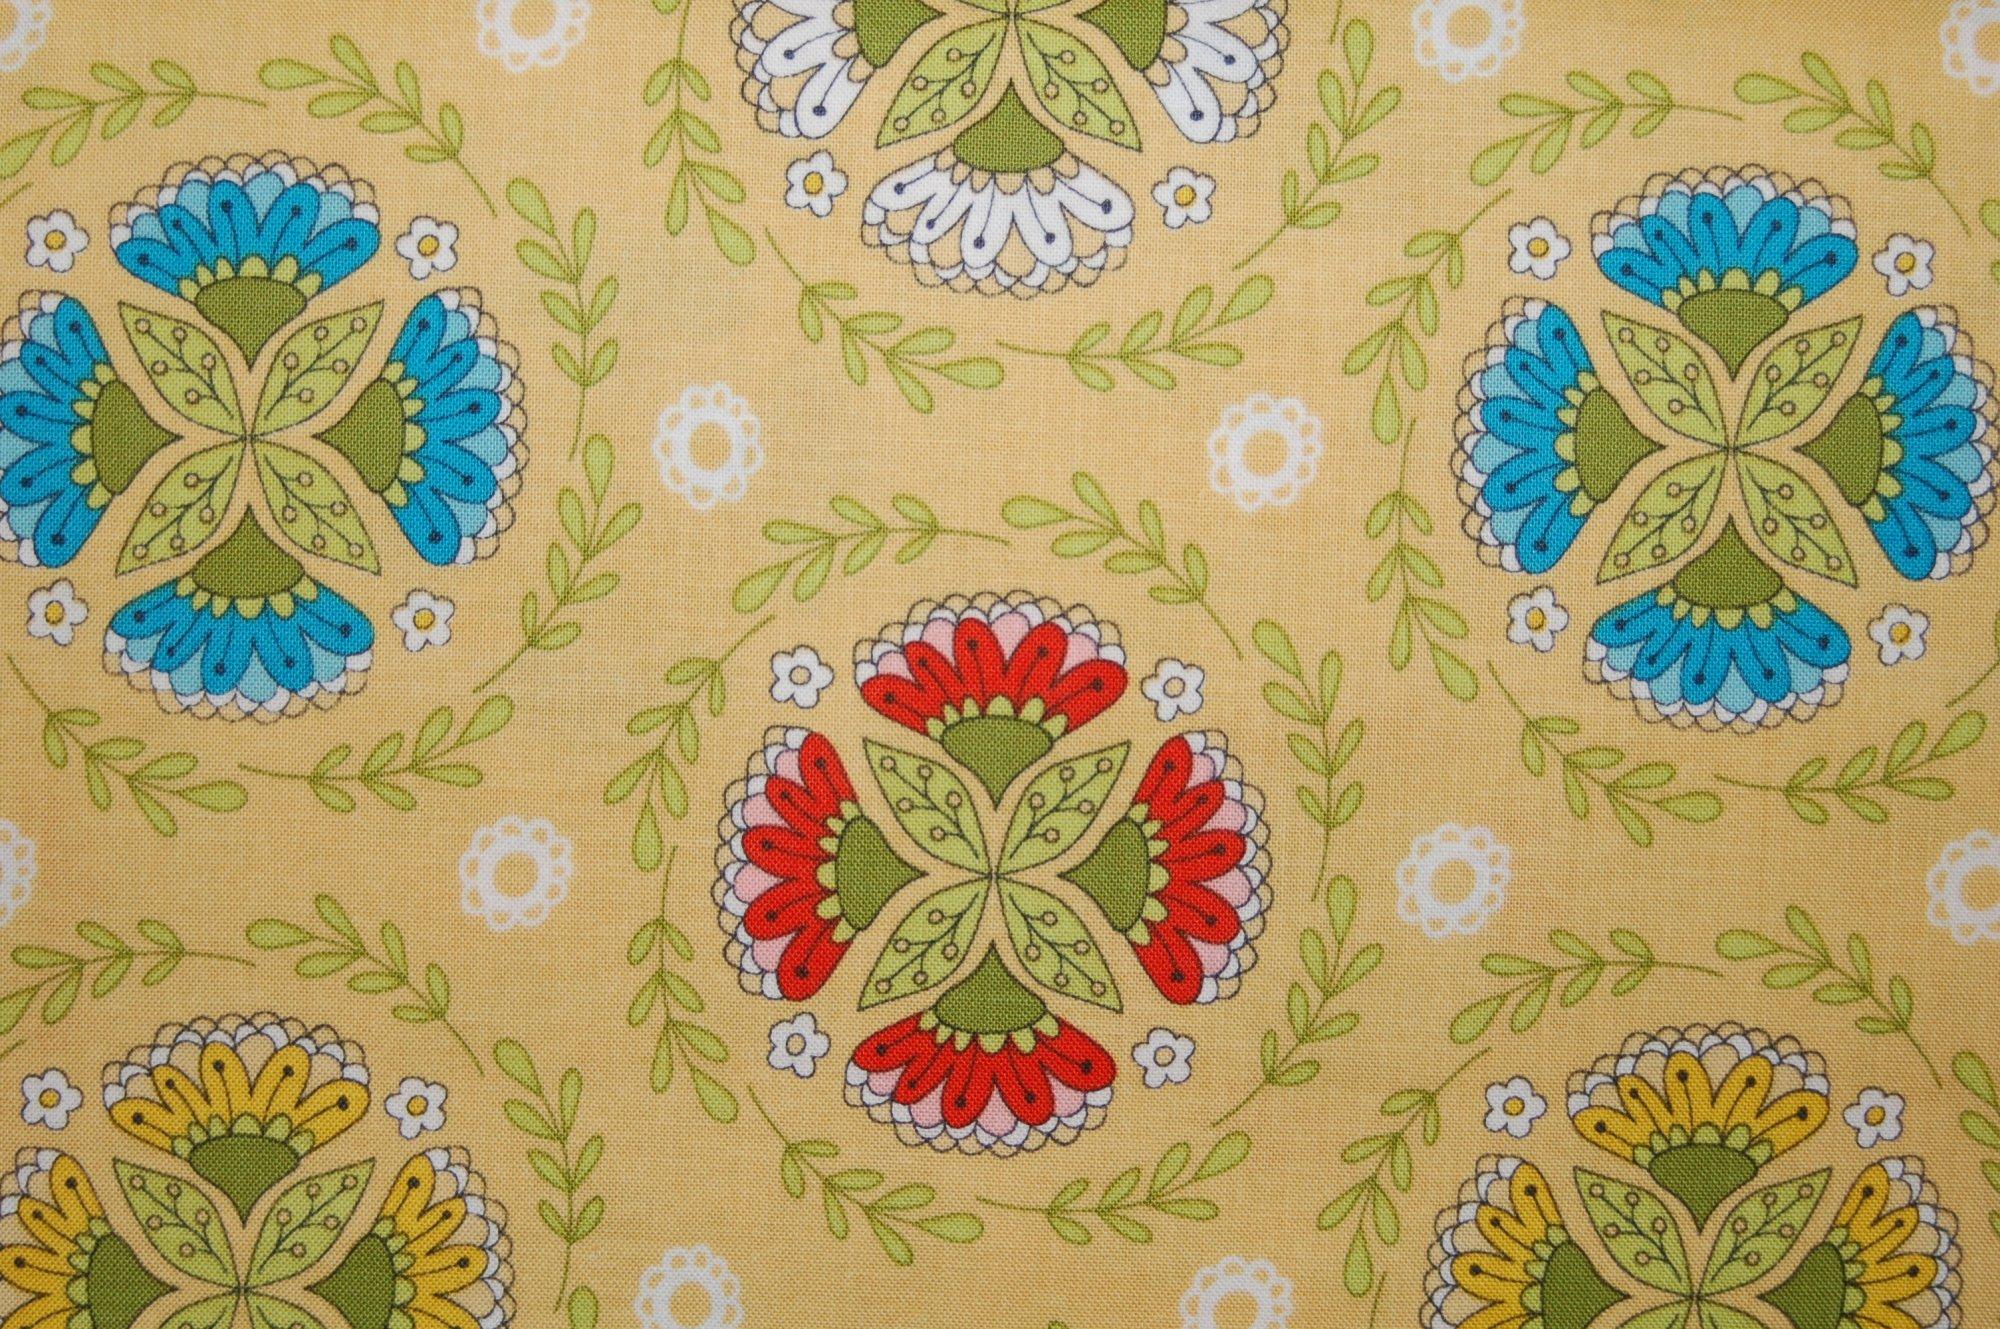 Dutch Treat - Wreath by Betz White for Riley Blake Designs